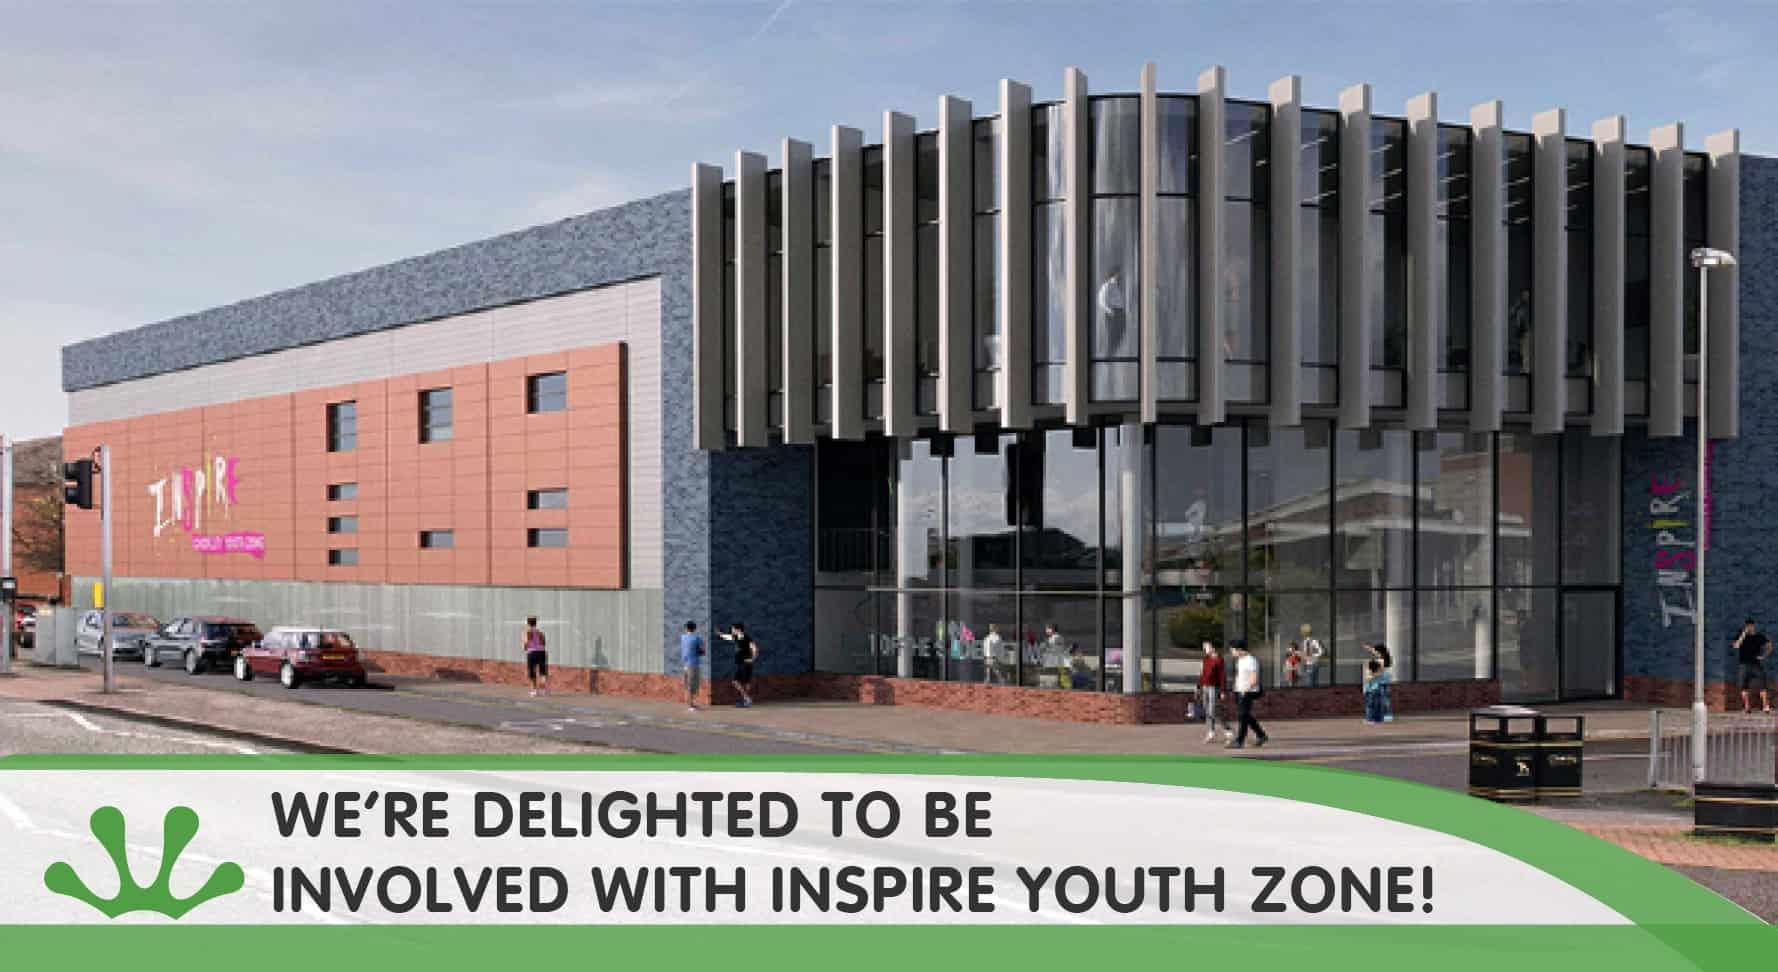 Chorley Youth Zone inspire blog image